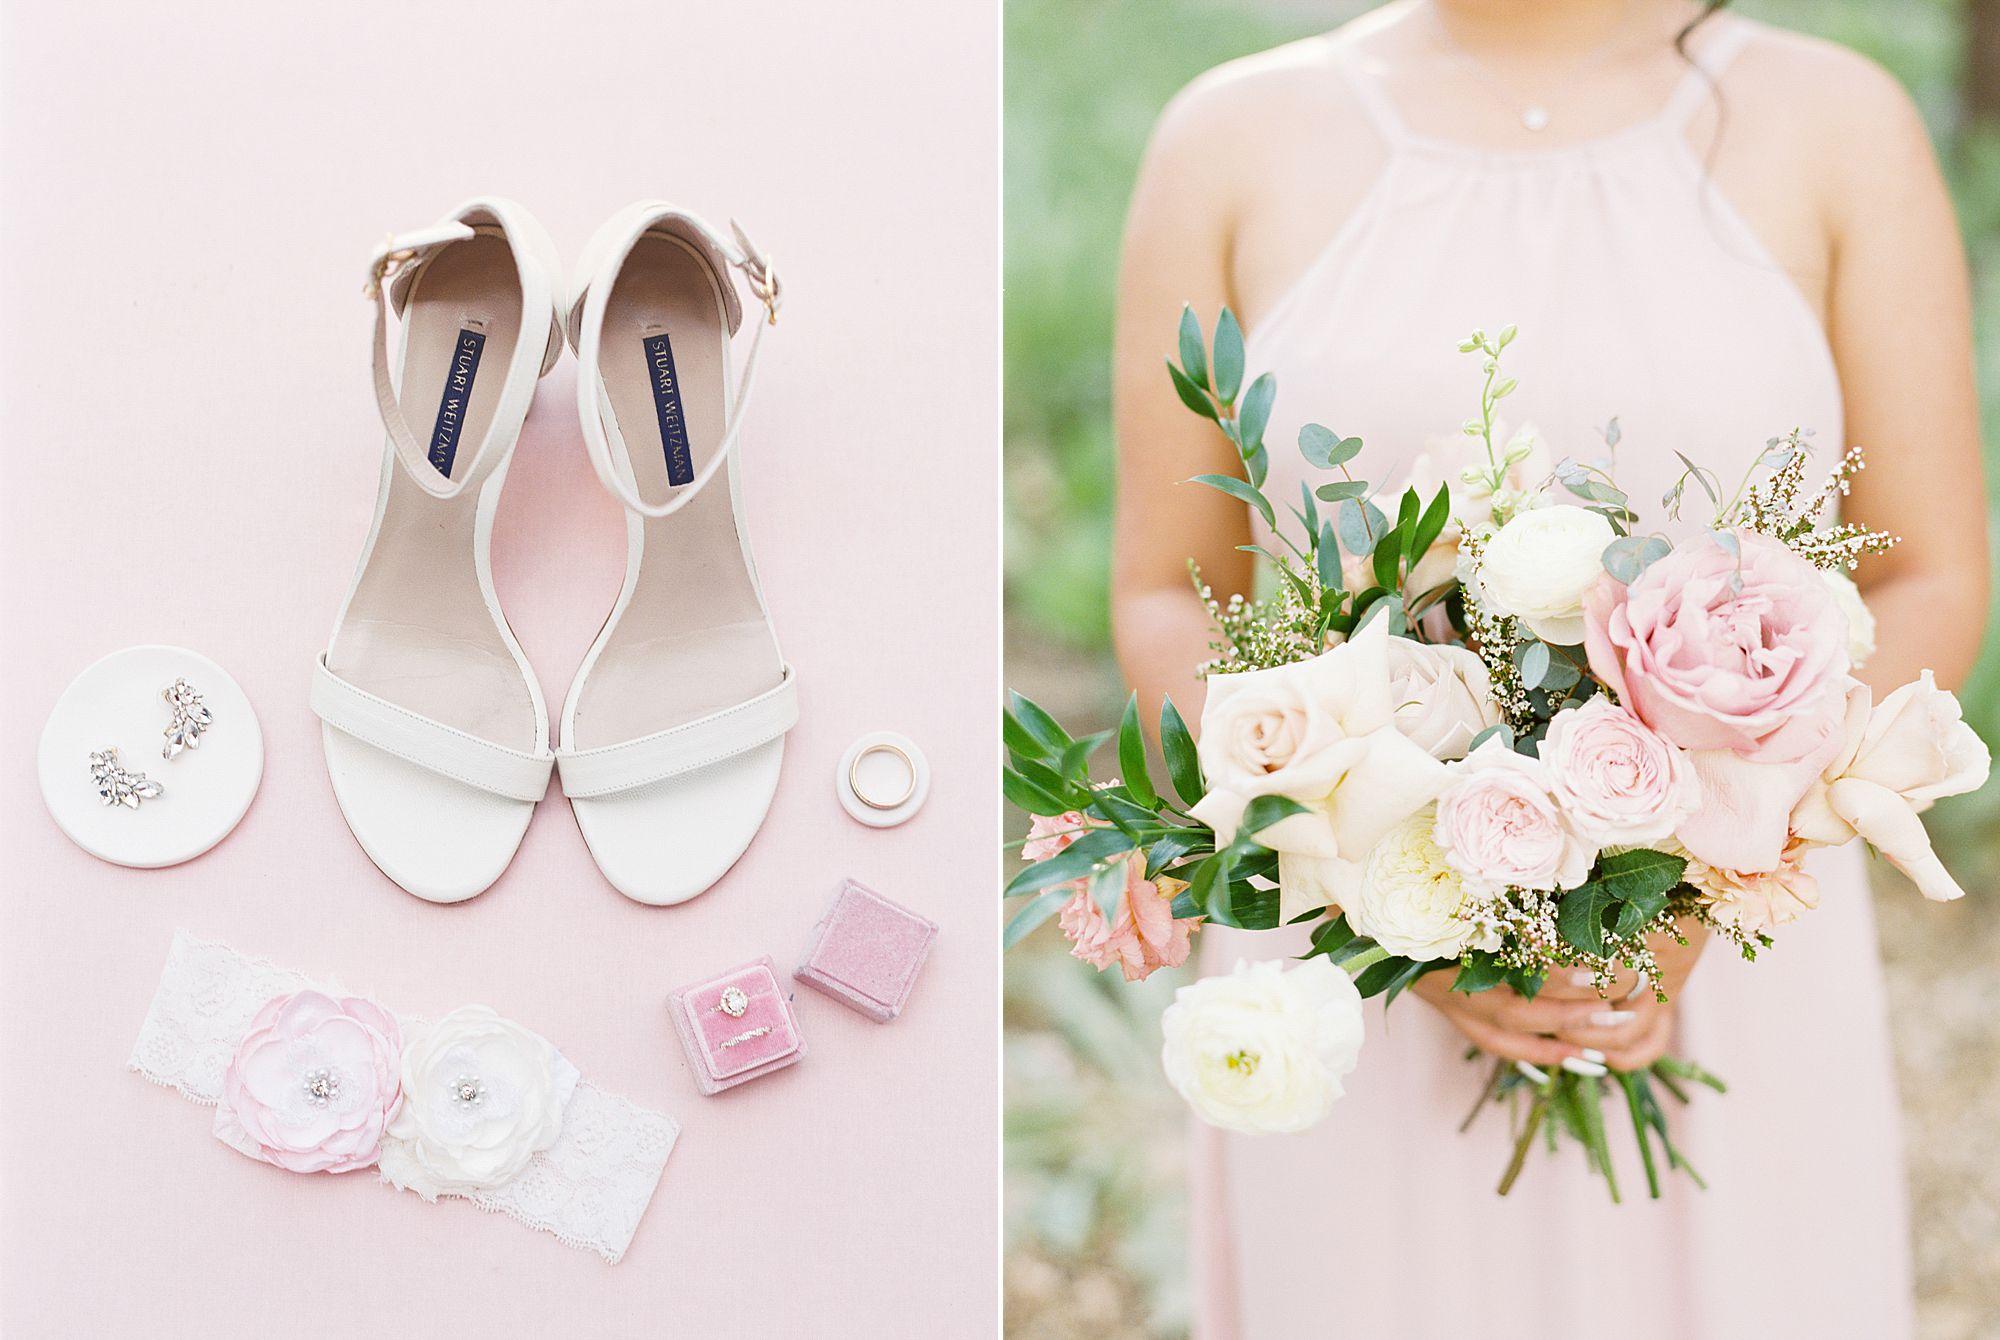 MITCHELLS MOUNTAIN MEADOWS Wedding - Ash Baumgartner - Phallina and Matt - Sierraville Wedding - Tahoe Wedding Photography_0002.jpg